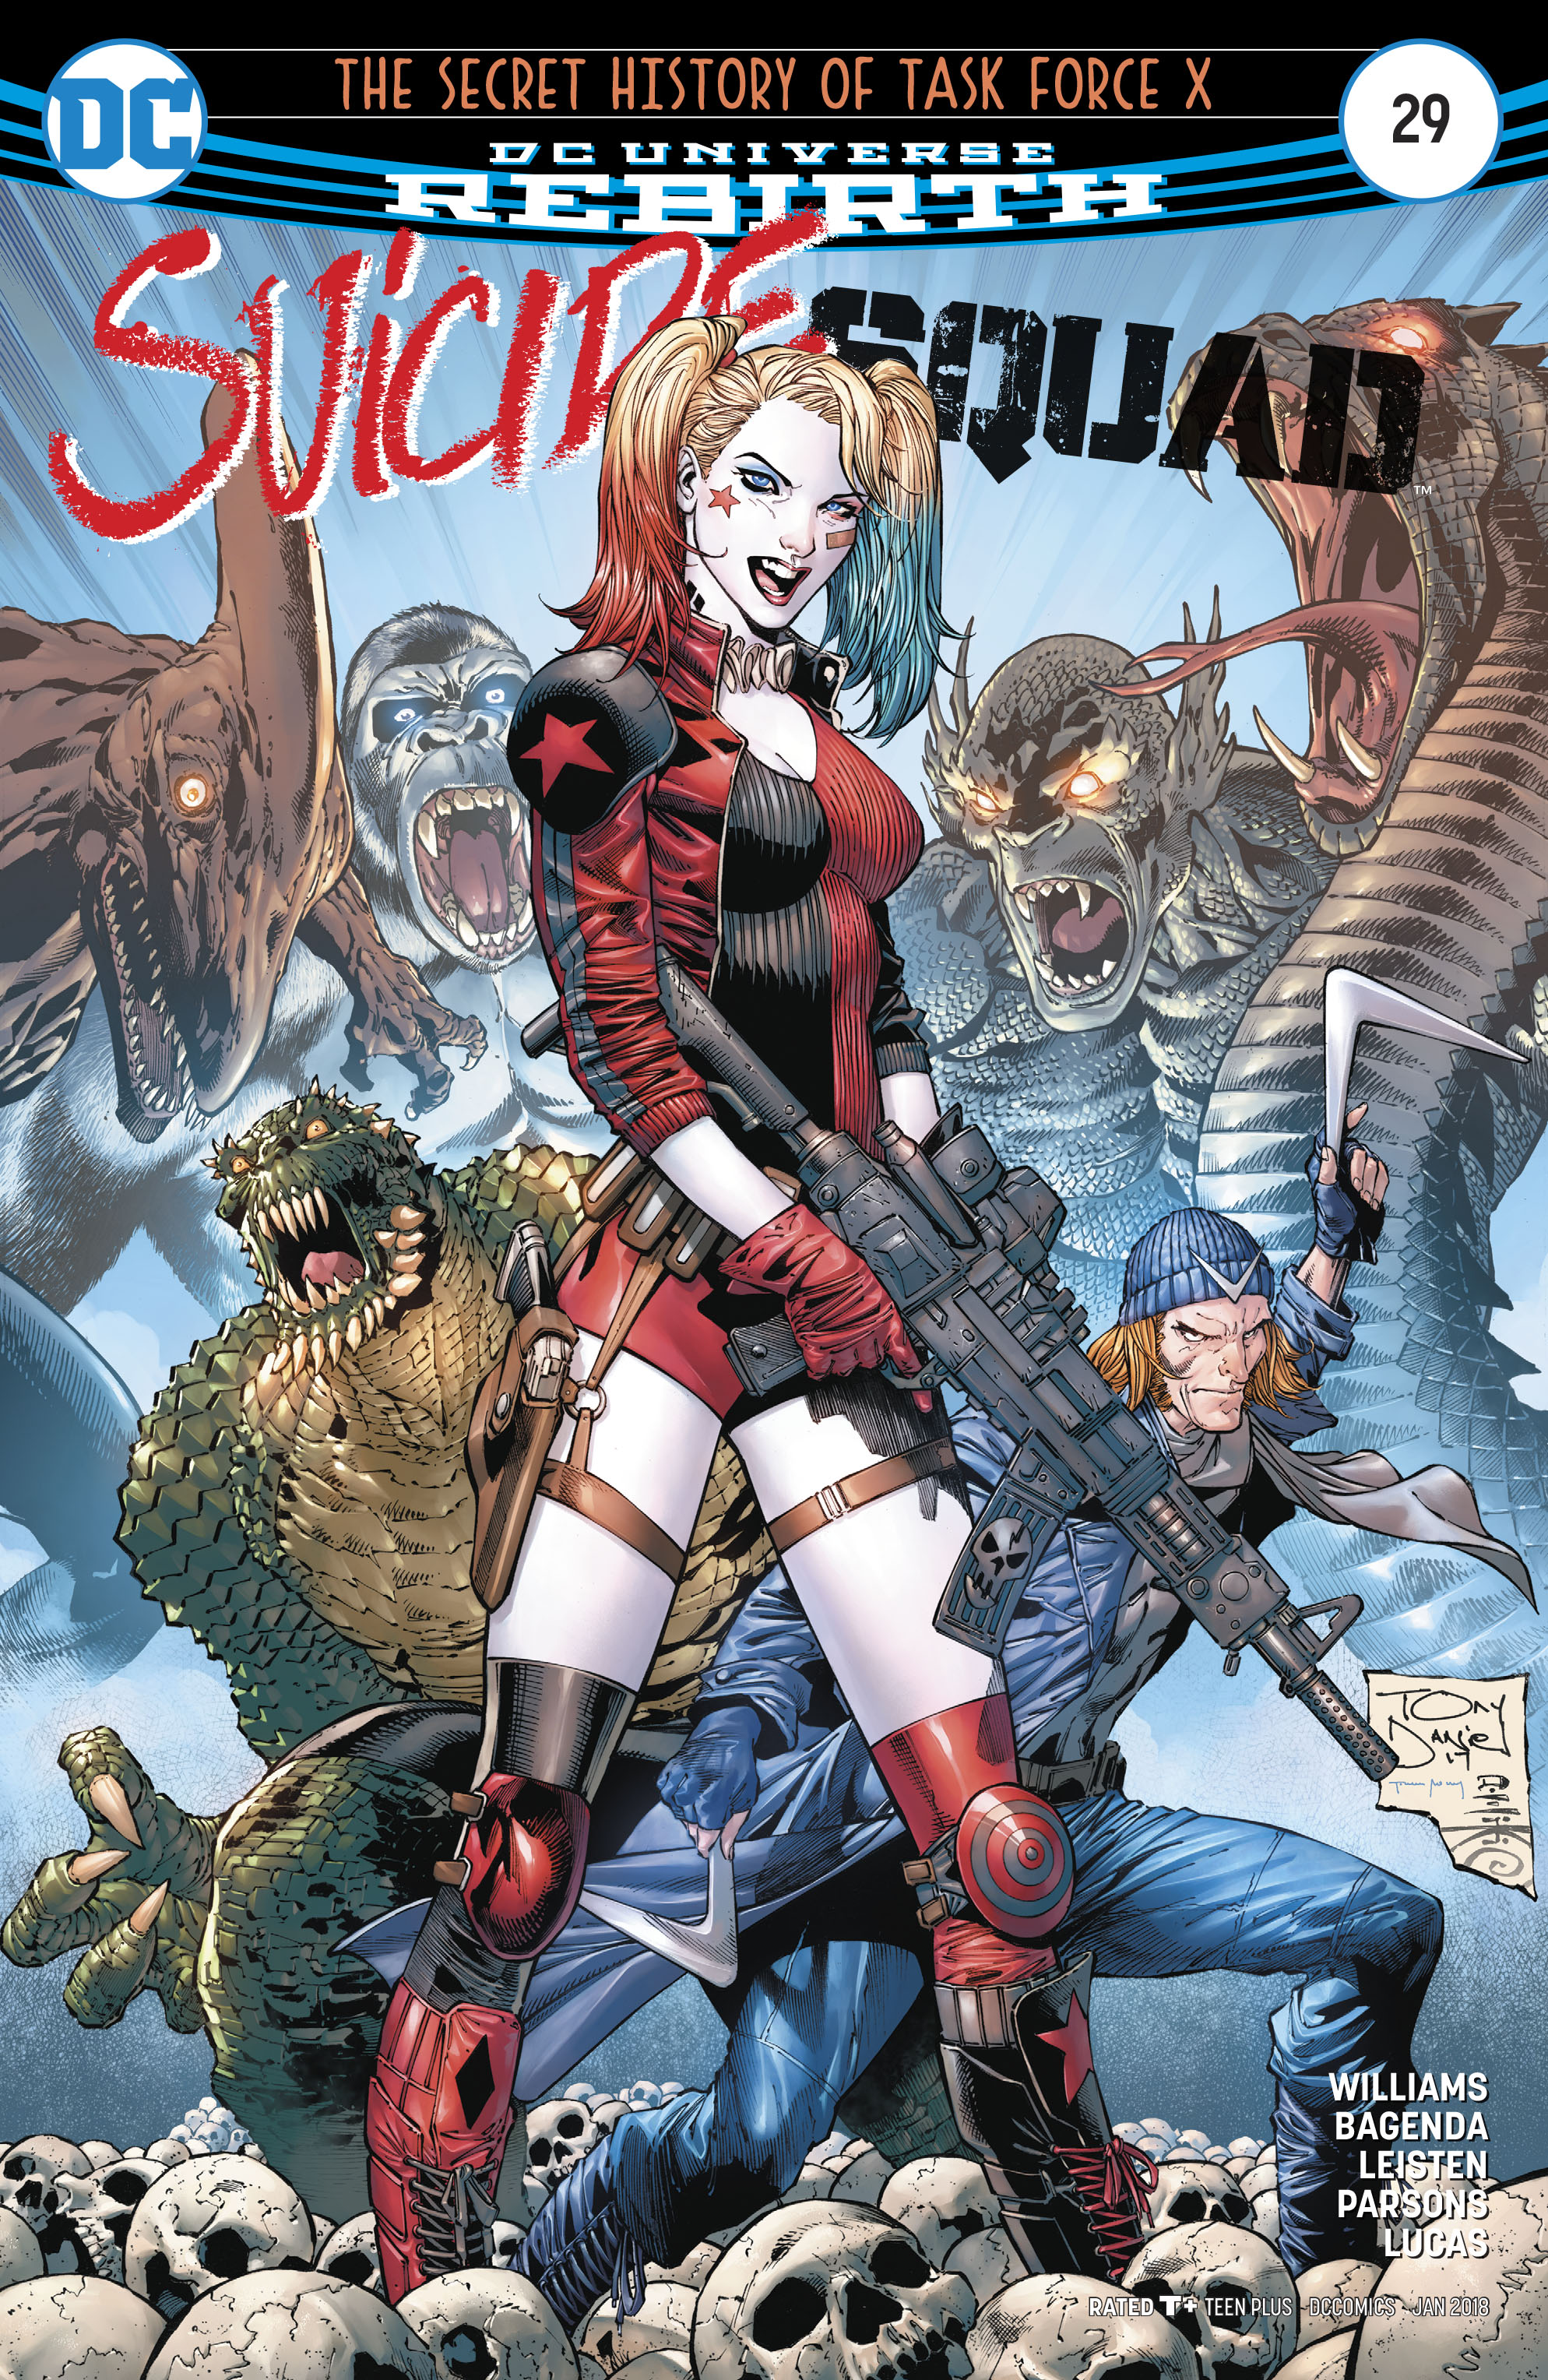 DC COMICS BATMAN ARKHAM KNIGHT #2 FEATURING HARLEY QUINN COVER SUICIDE SQUAD